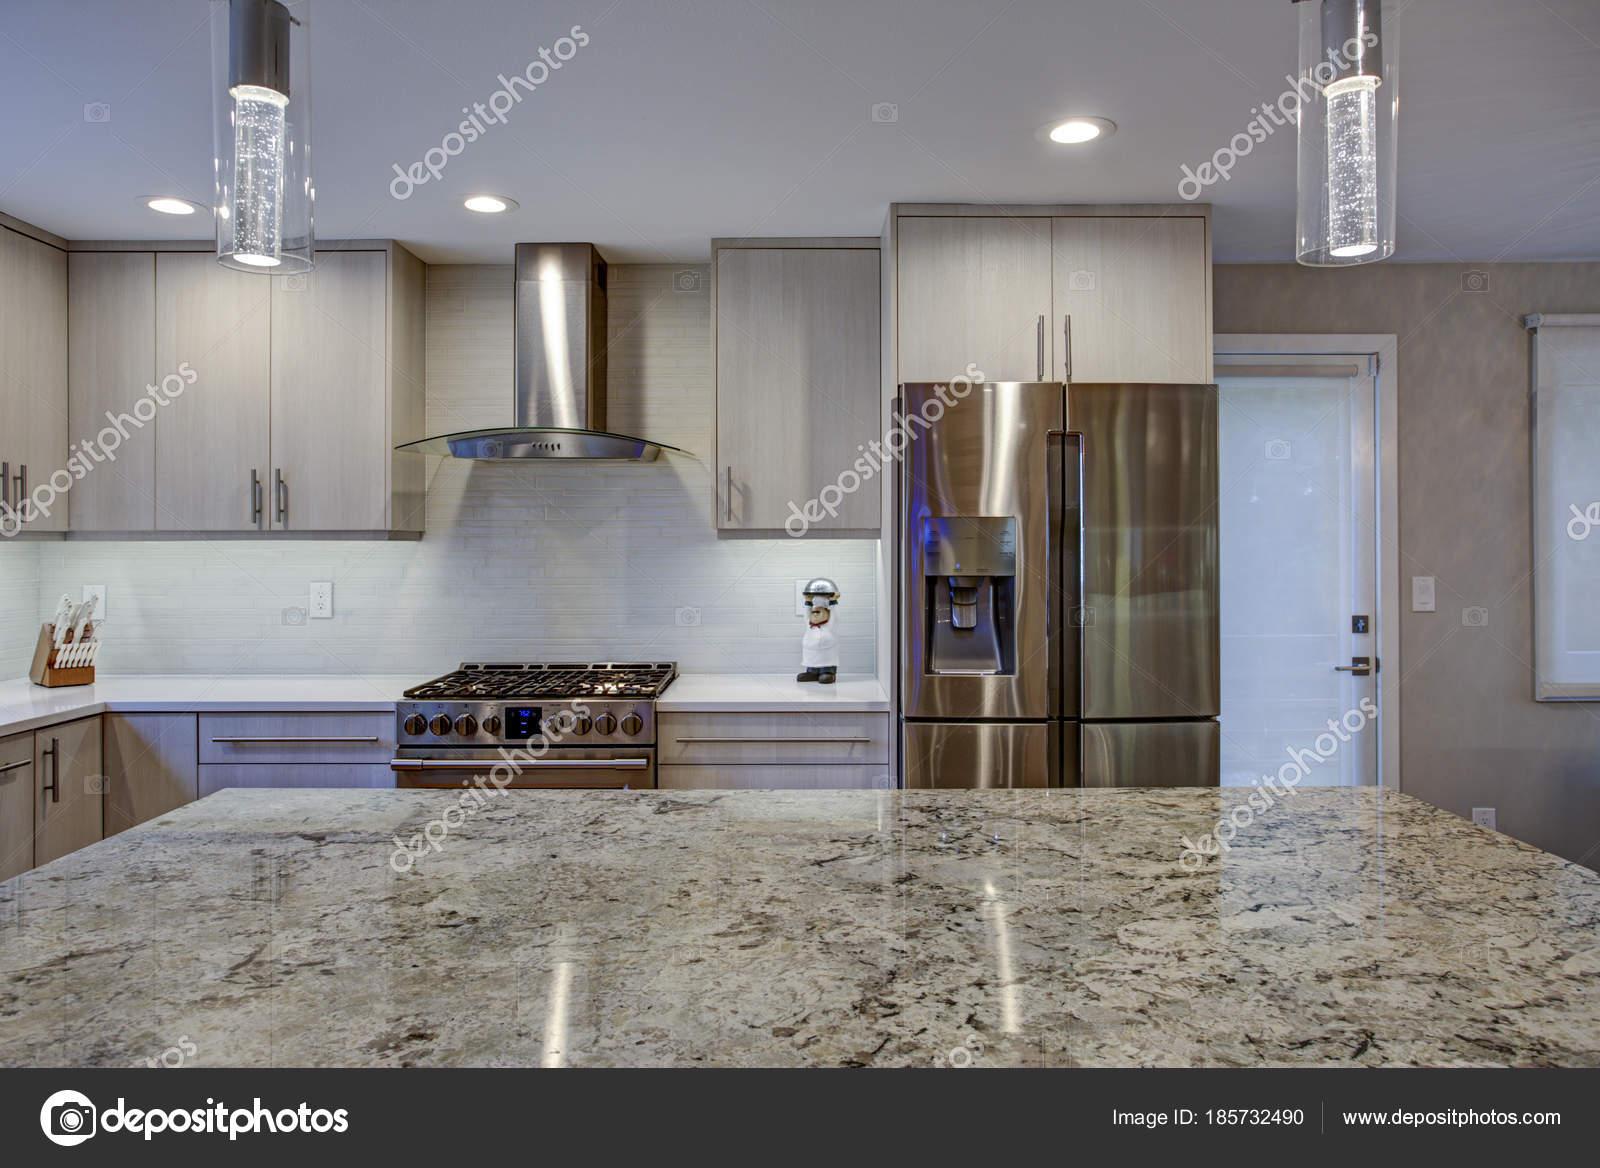 Camera bella cucina con isola di cucina — Foto Stock © alabn #185732490